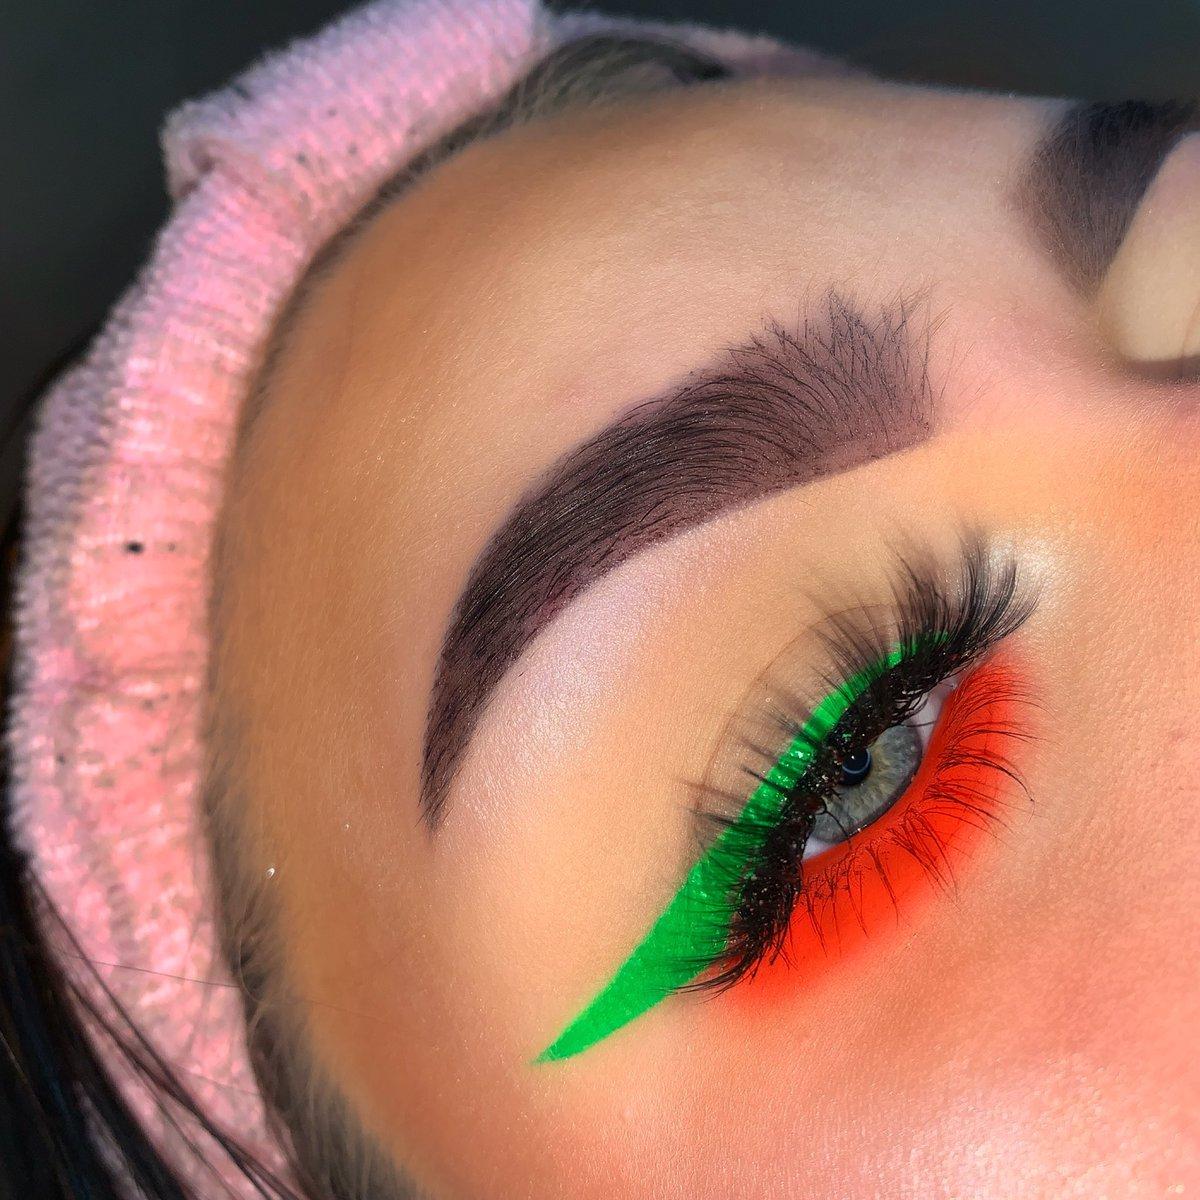 Simple neon look using @Bowsbeautyxx1 Aqua liner in Cactus•Neon pigment in Sex on the beach~@daxiebeauty Lashes in style Stella~@MakeupRVLTN Brow pencil in Dark brown~@xmemebeautyx Brow soap #makeup #makeupartist #mua #selftaughtmua #neon #makeuplookspic.twitter.com/J0Q9QVnapV